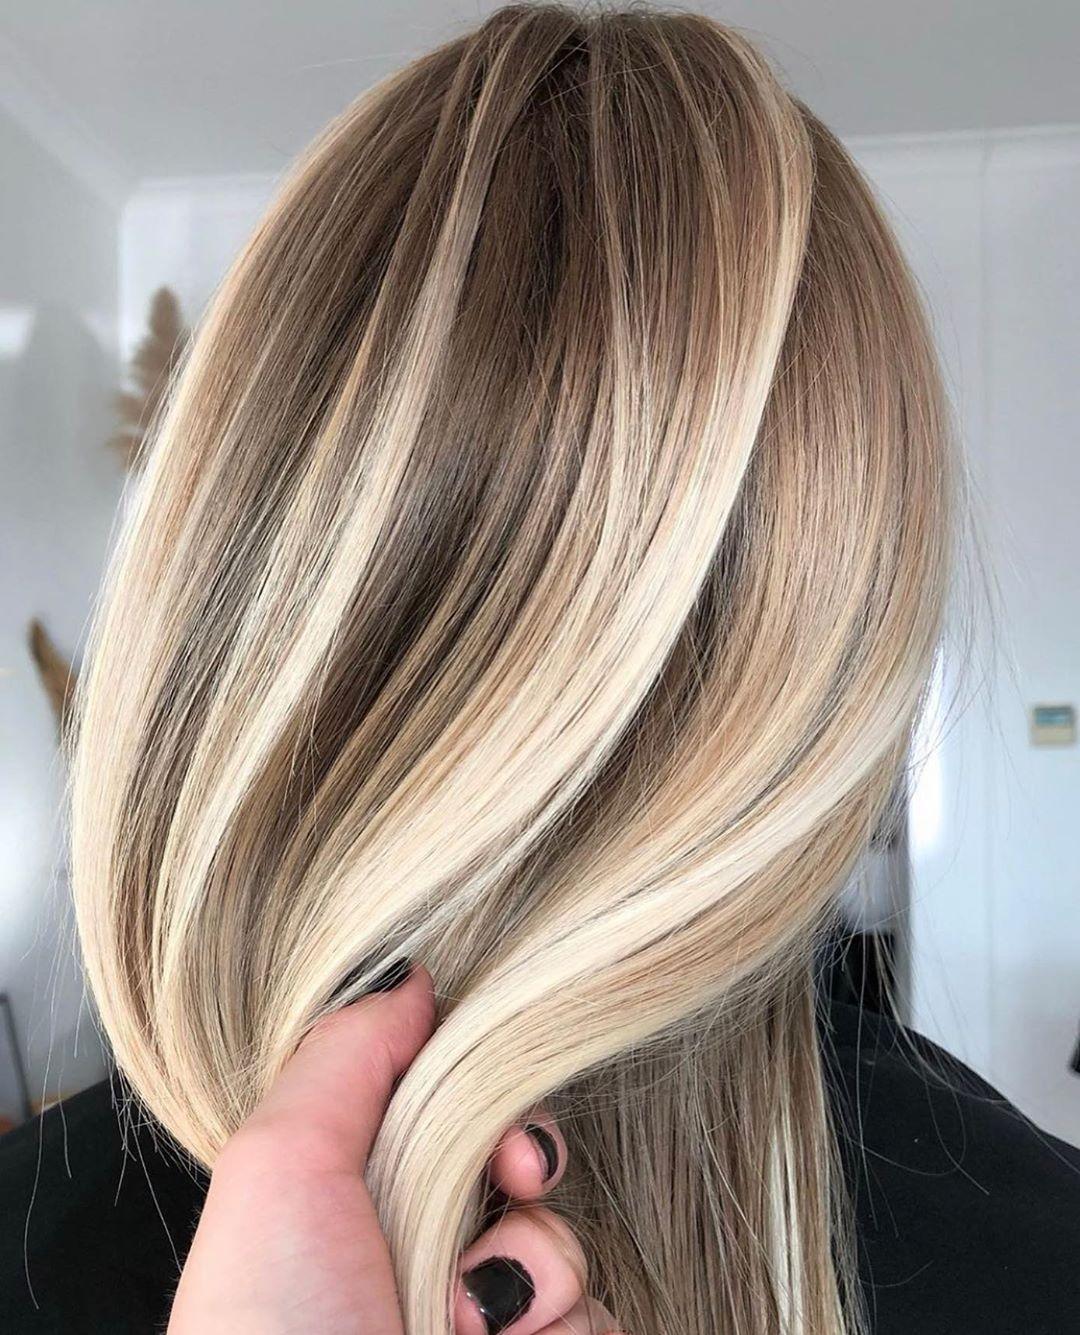 Boutique Blonde Salon On Instagram Ummm Ok Kirstyannehair You Better Get It Dimensiona Couleur De Cheveux Fantaisie Idee Couleur Cheveux Meches Colorees